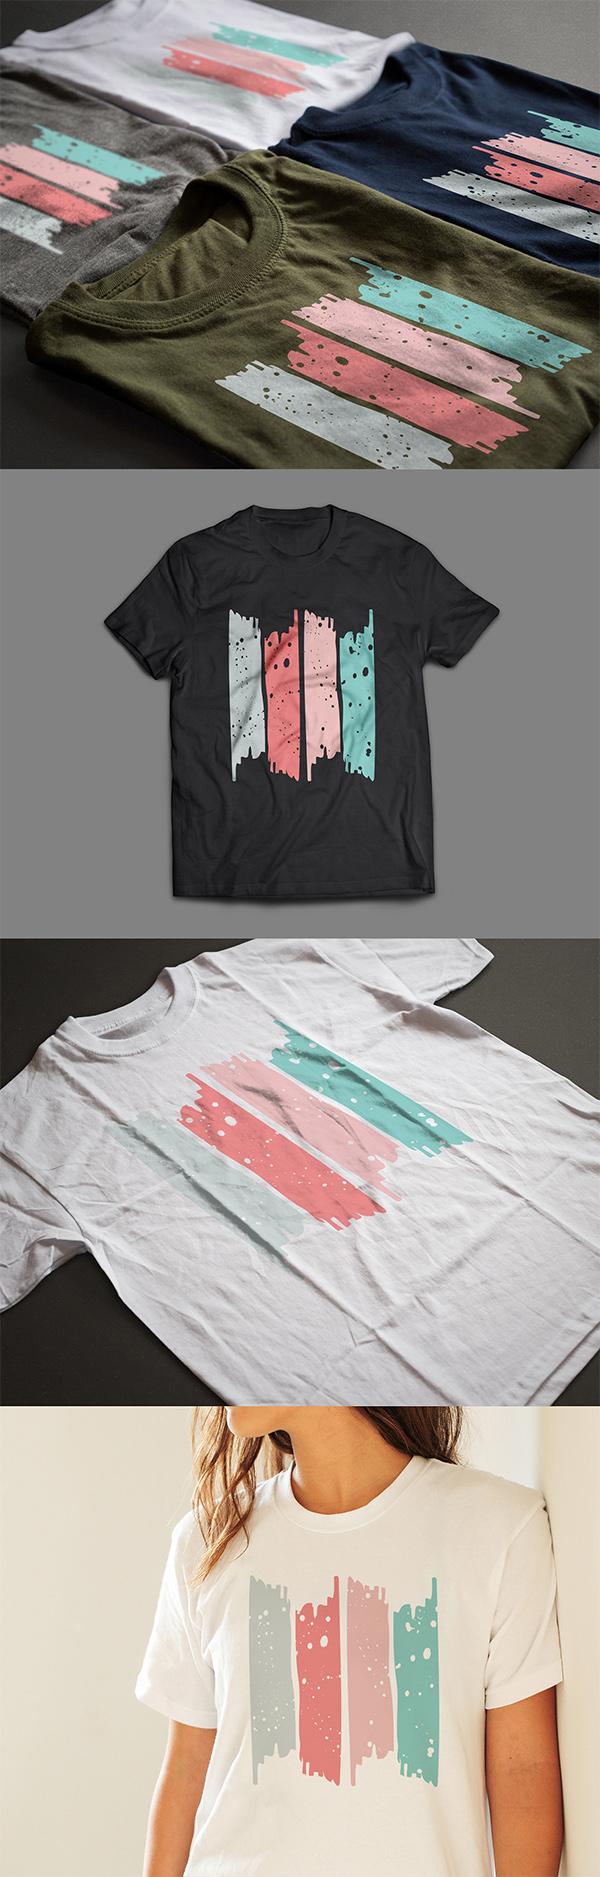 Free T-Shirt Mockup Templates PSD - Free T-Shirt Mockups